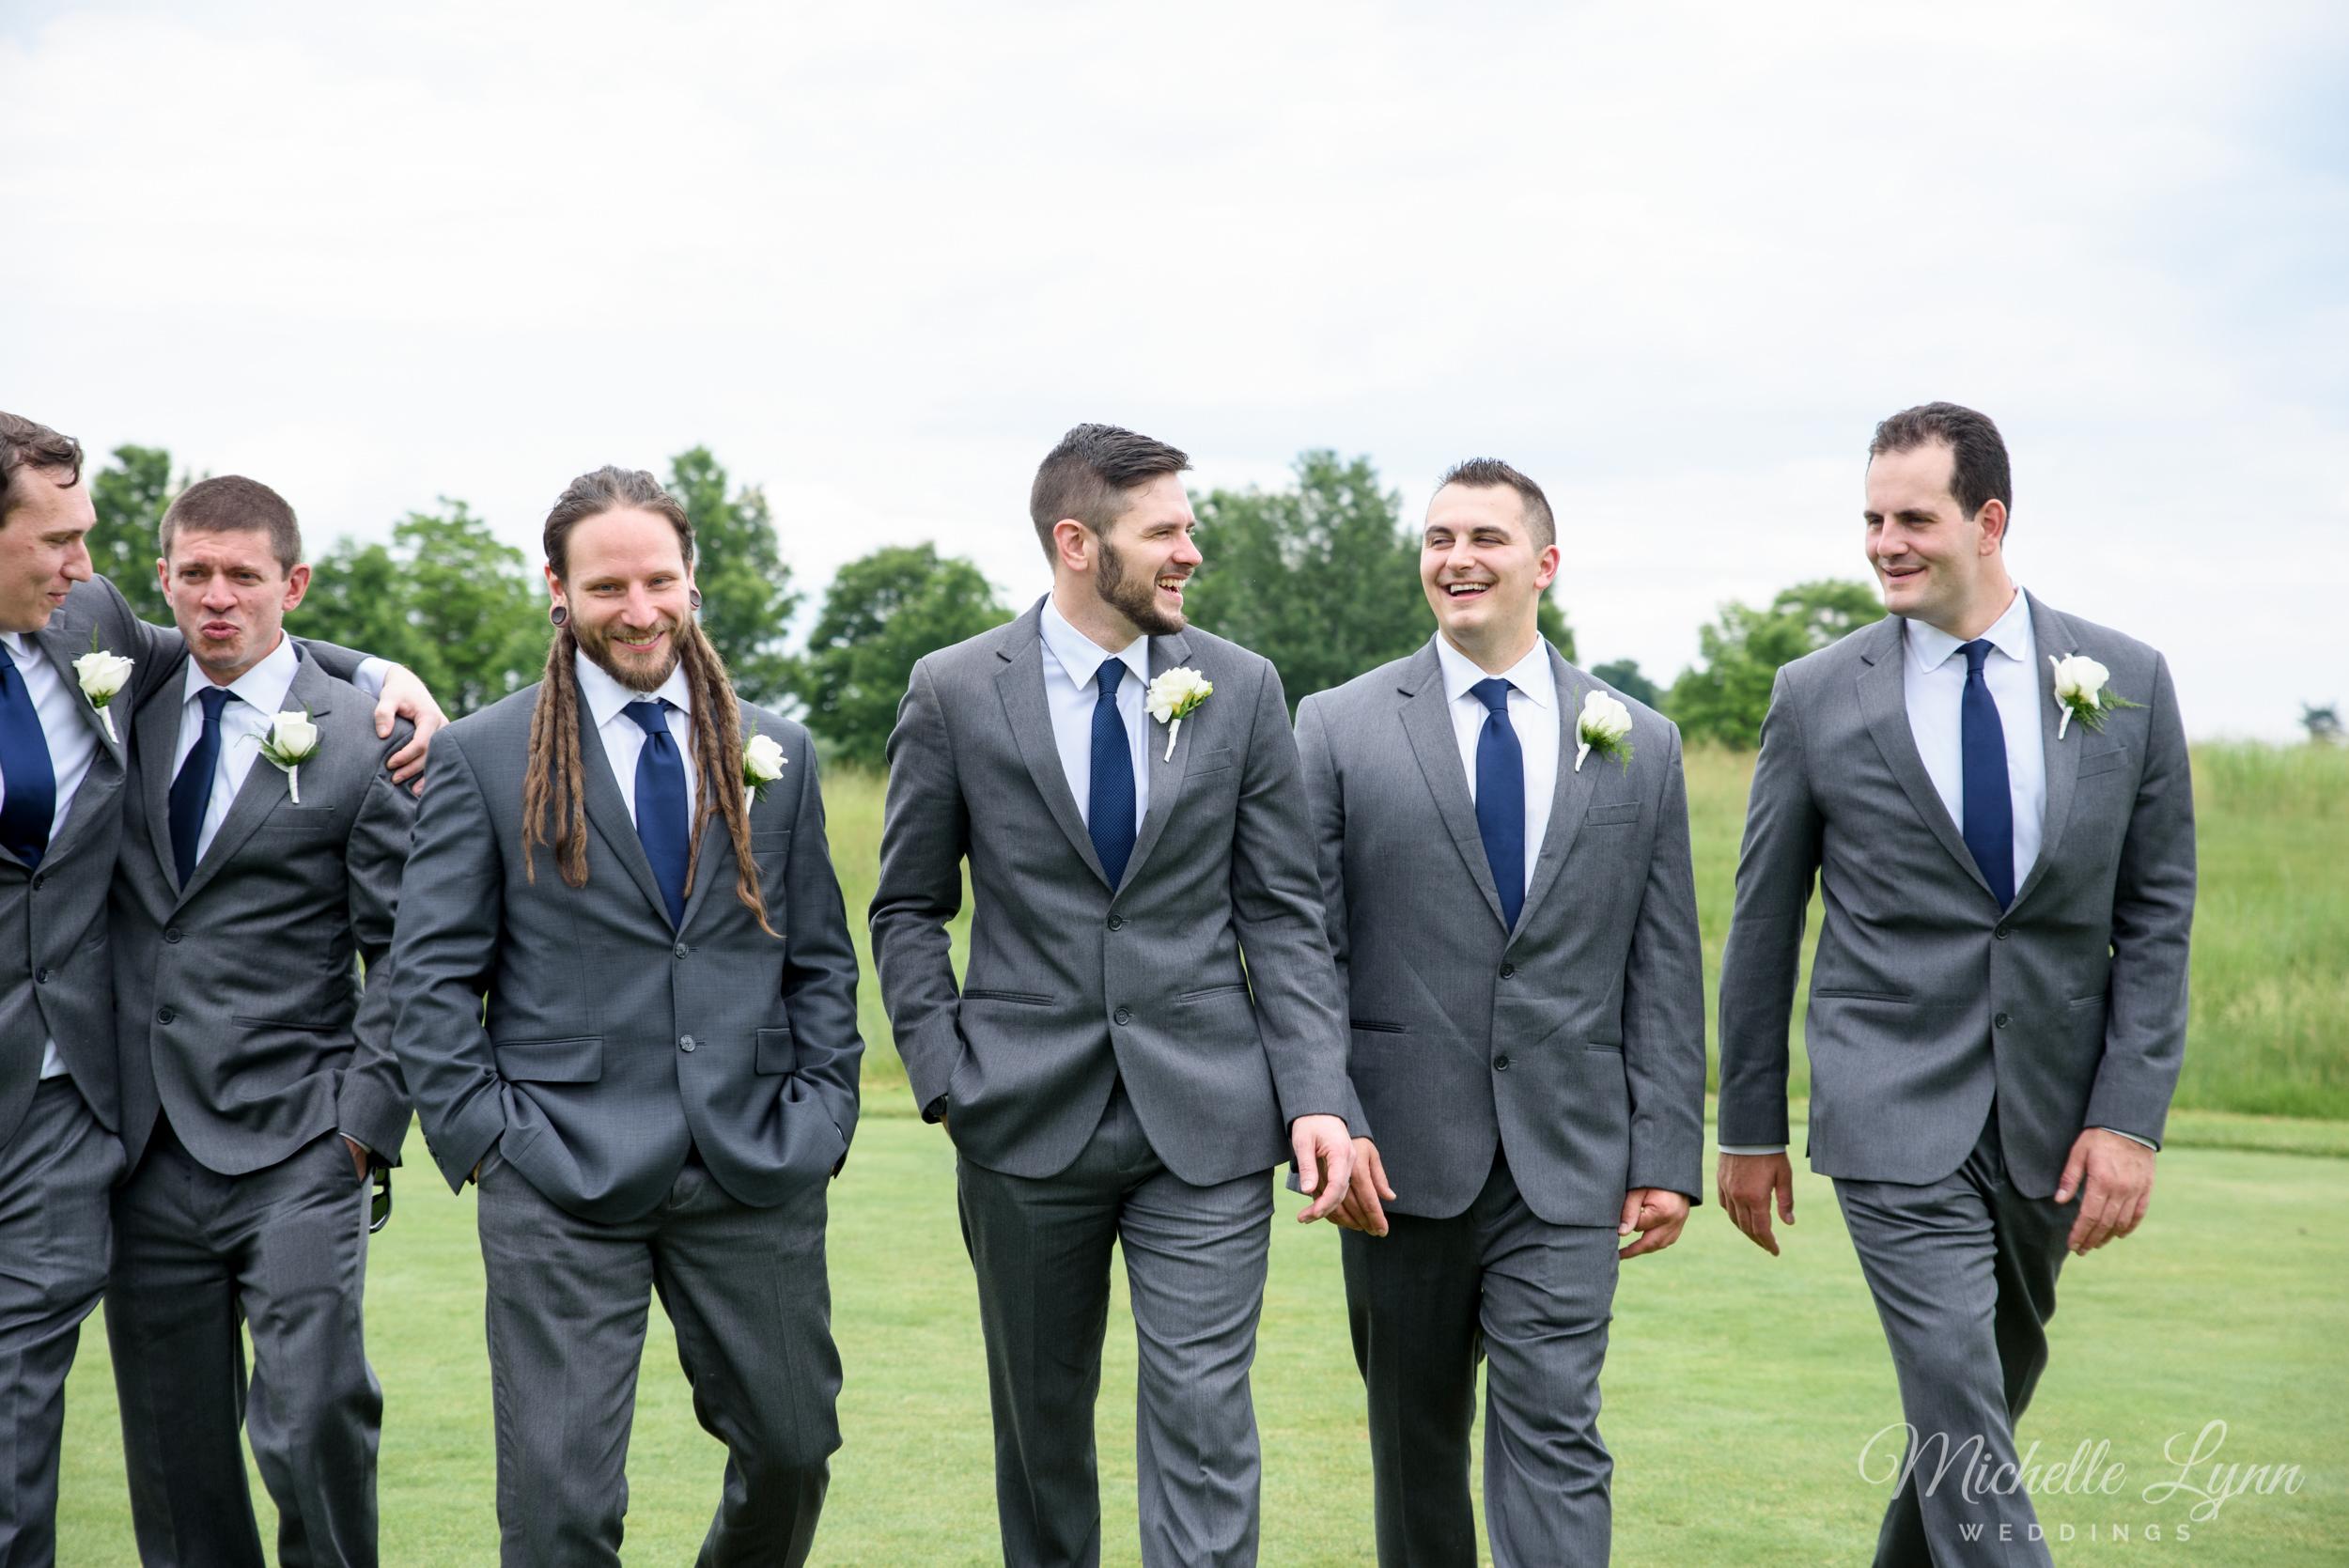 mlw-jericho-national-golf-club-wedding-photography-49.jpg